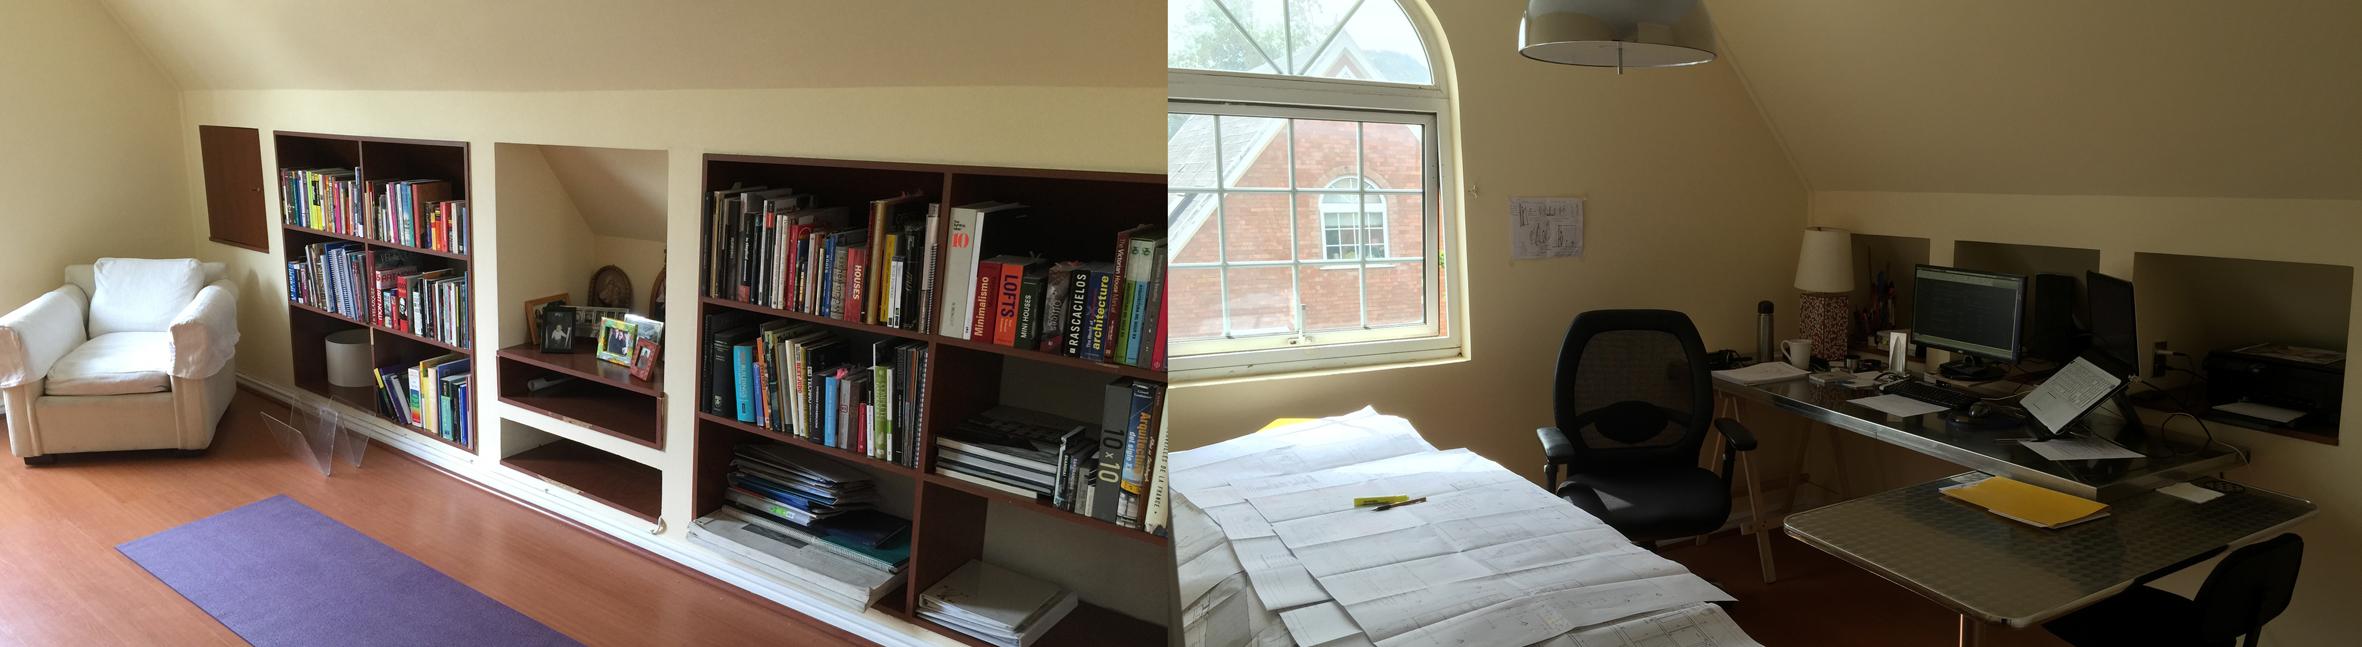 casa estudio